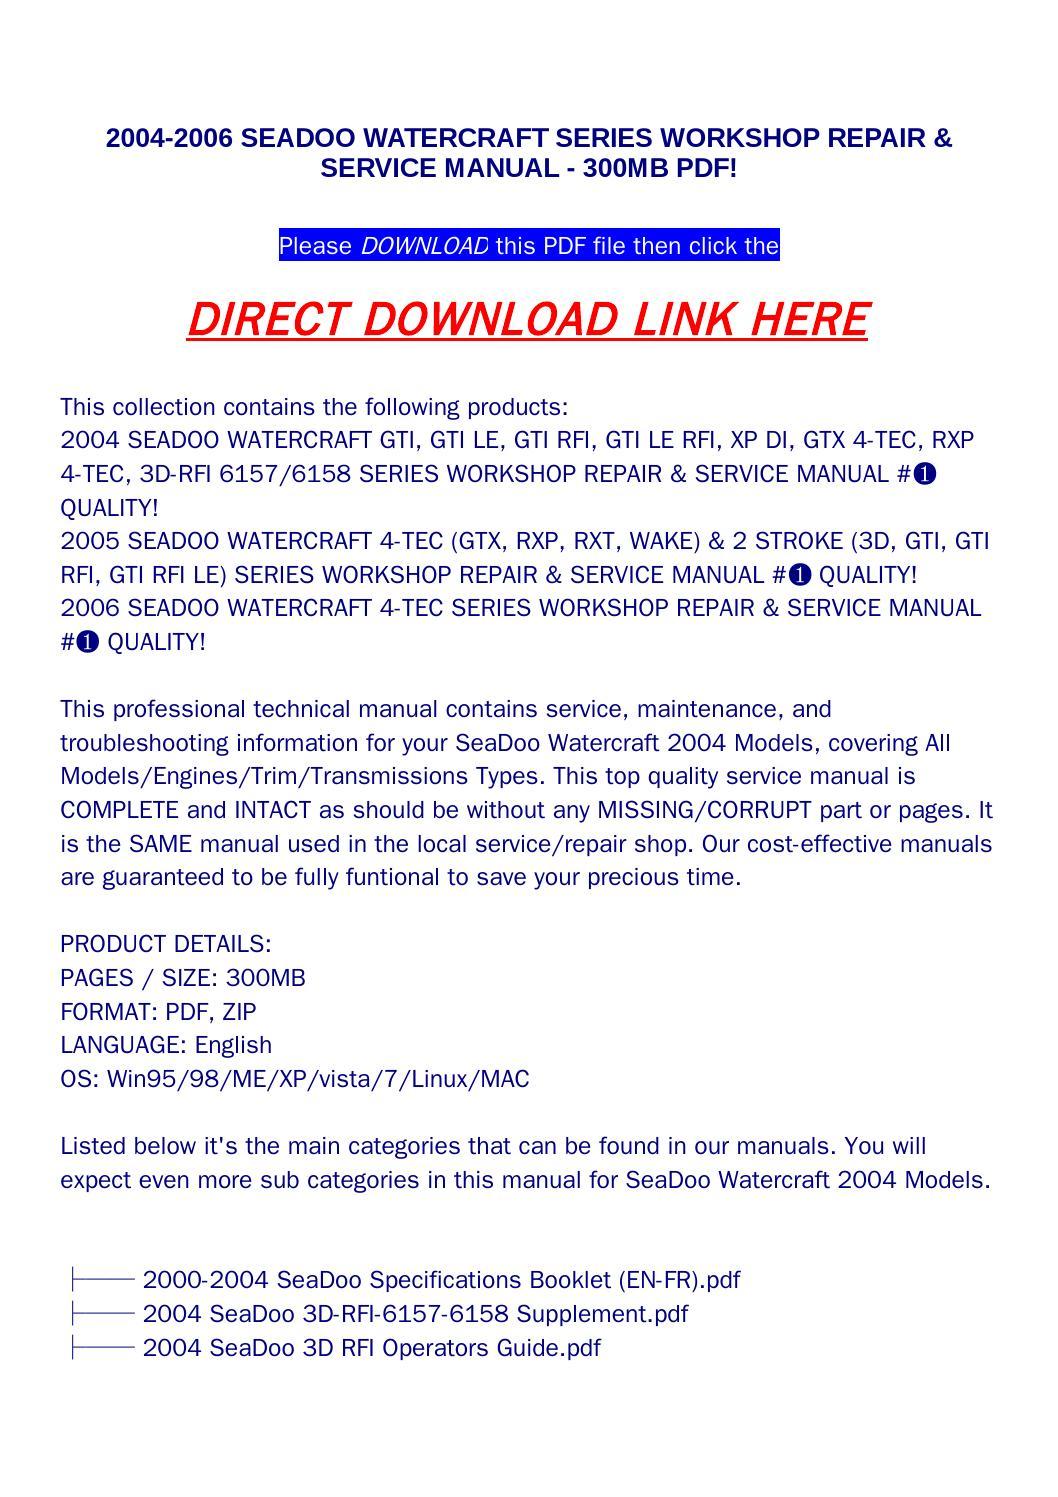 2004 2006 seadoo watercraft series workshop repair & service manual 300mb  pdf! by disrtrtog - issuu